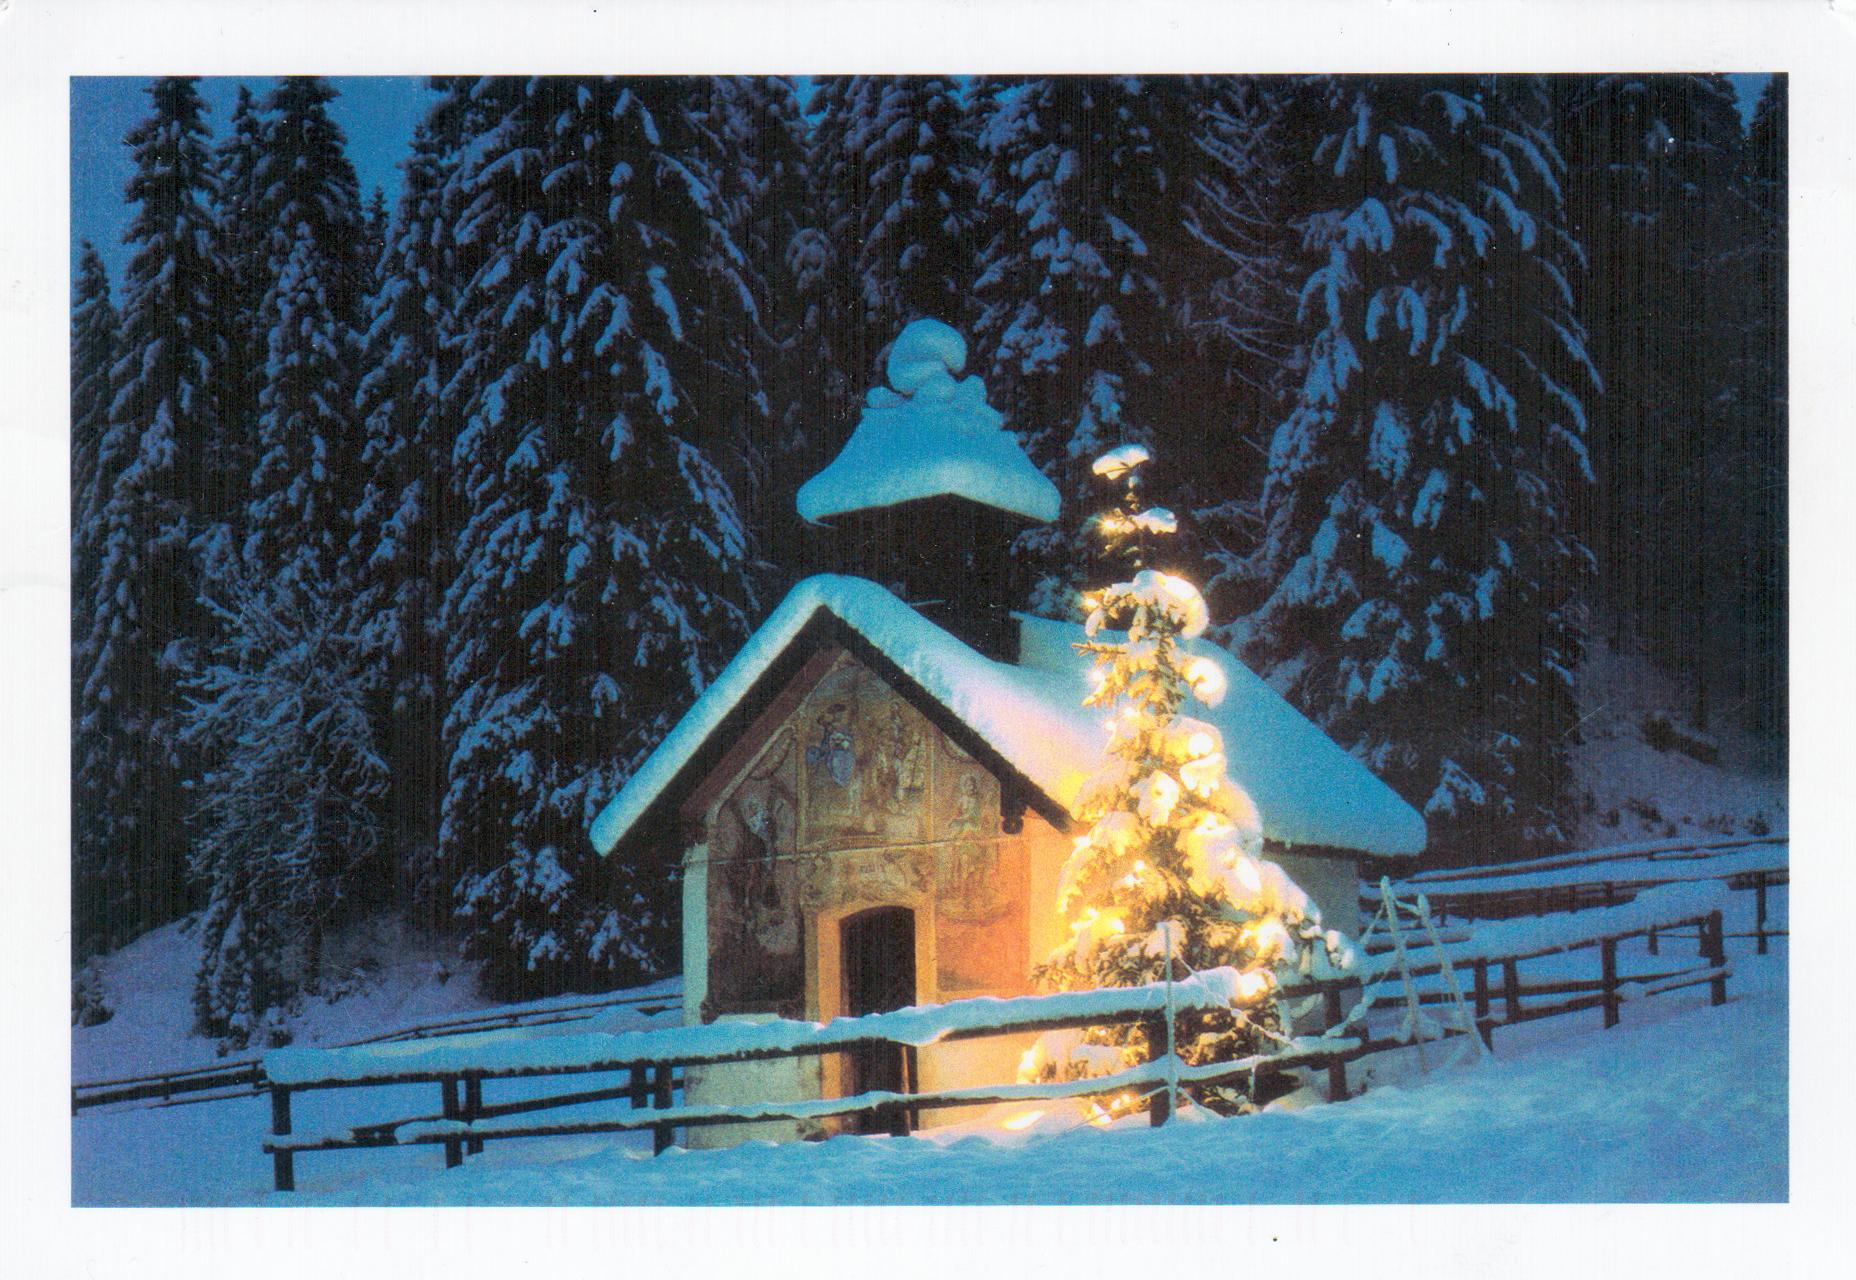 Christmas postcard (Switzerland)